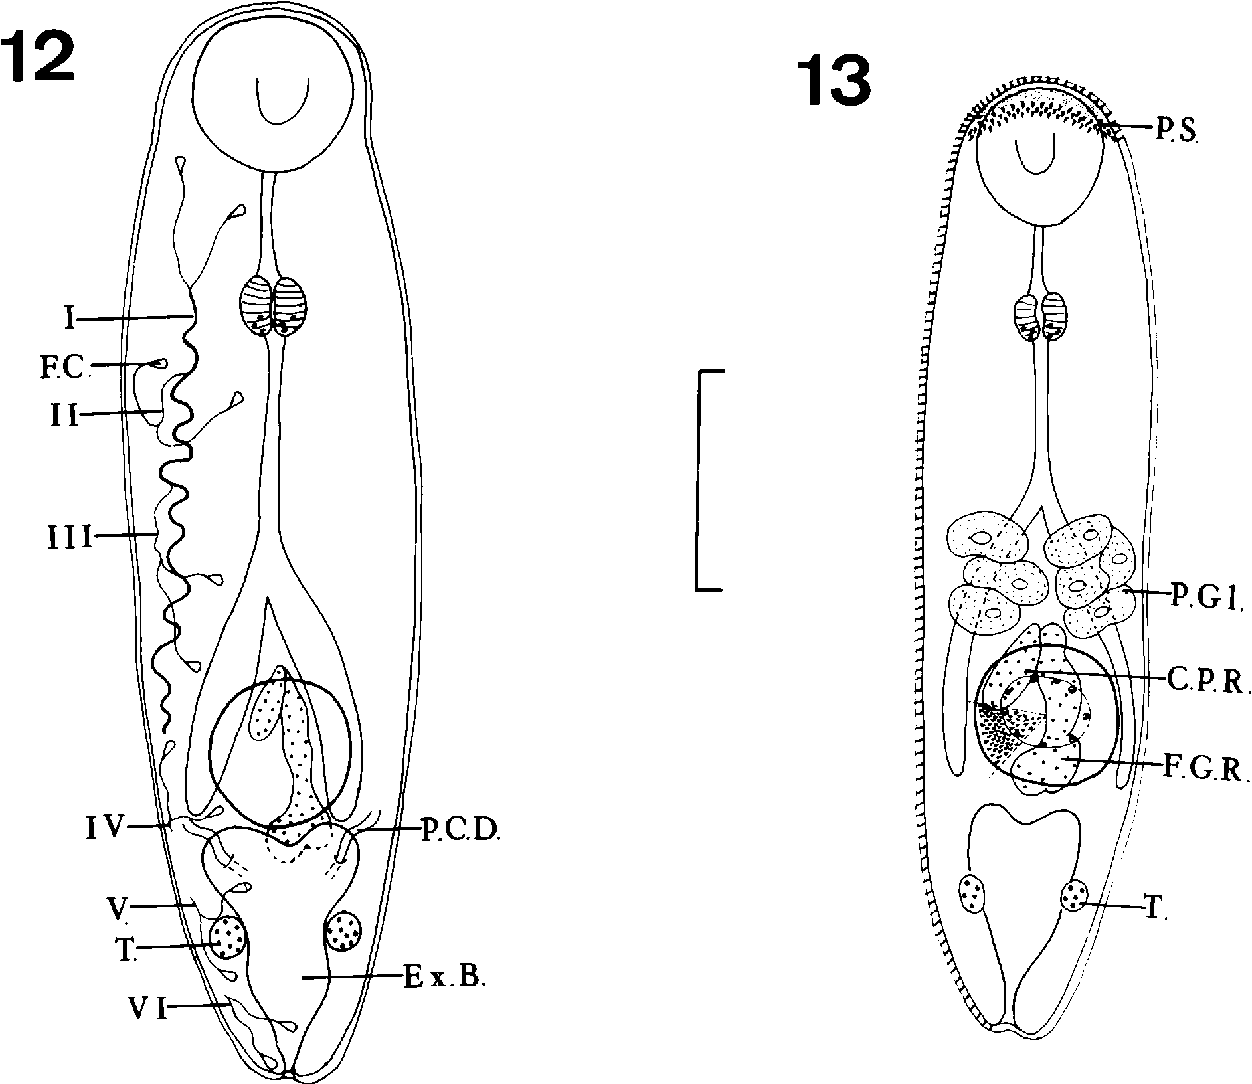 figure 12–13